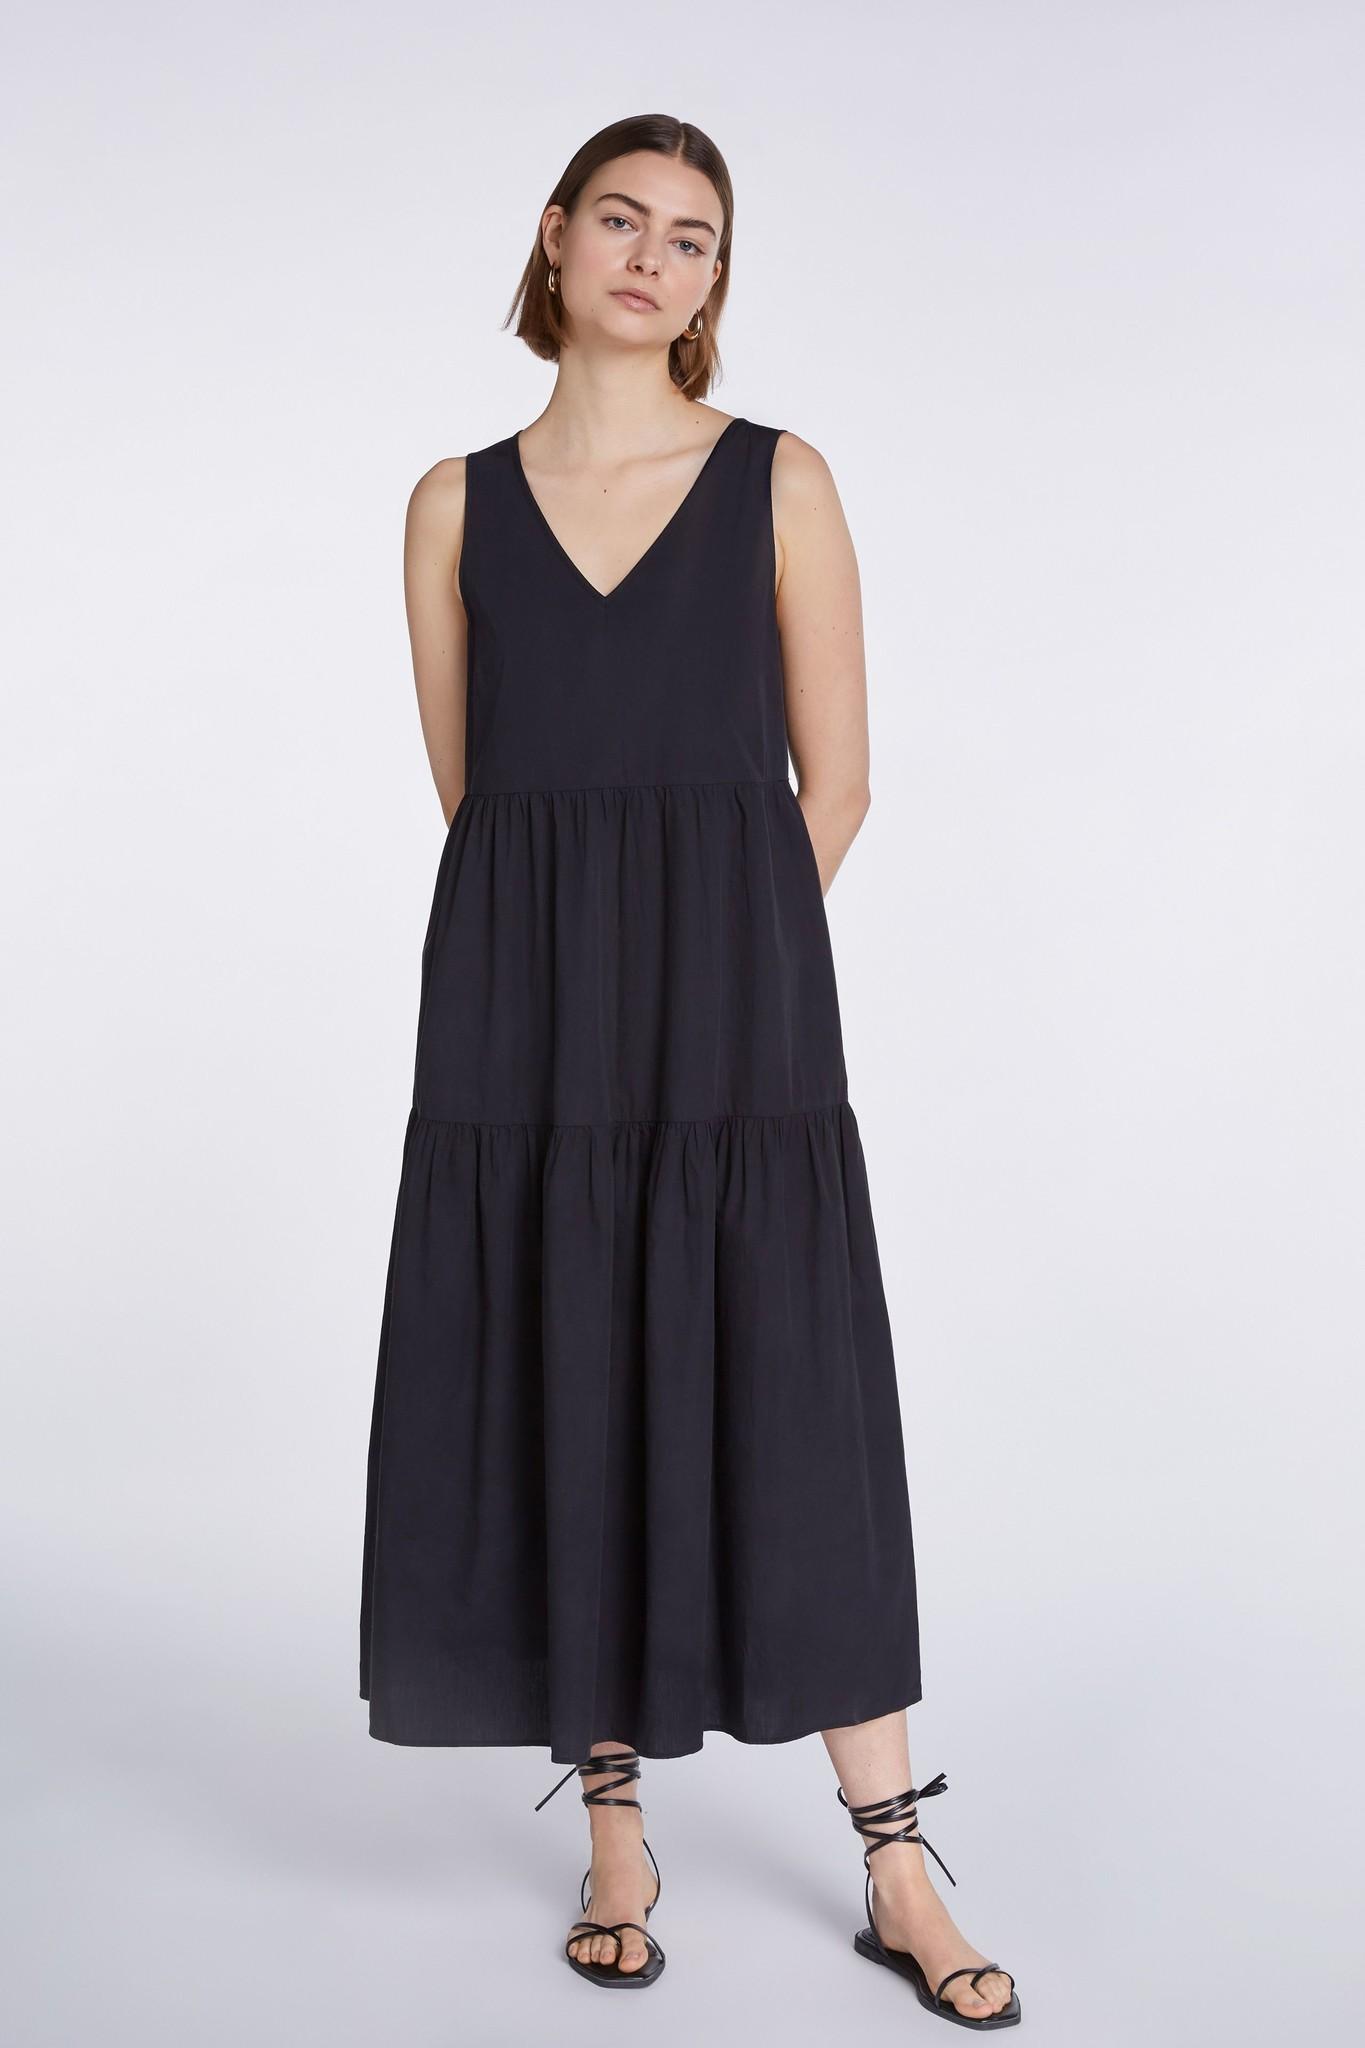 SET dress 721905110403-1